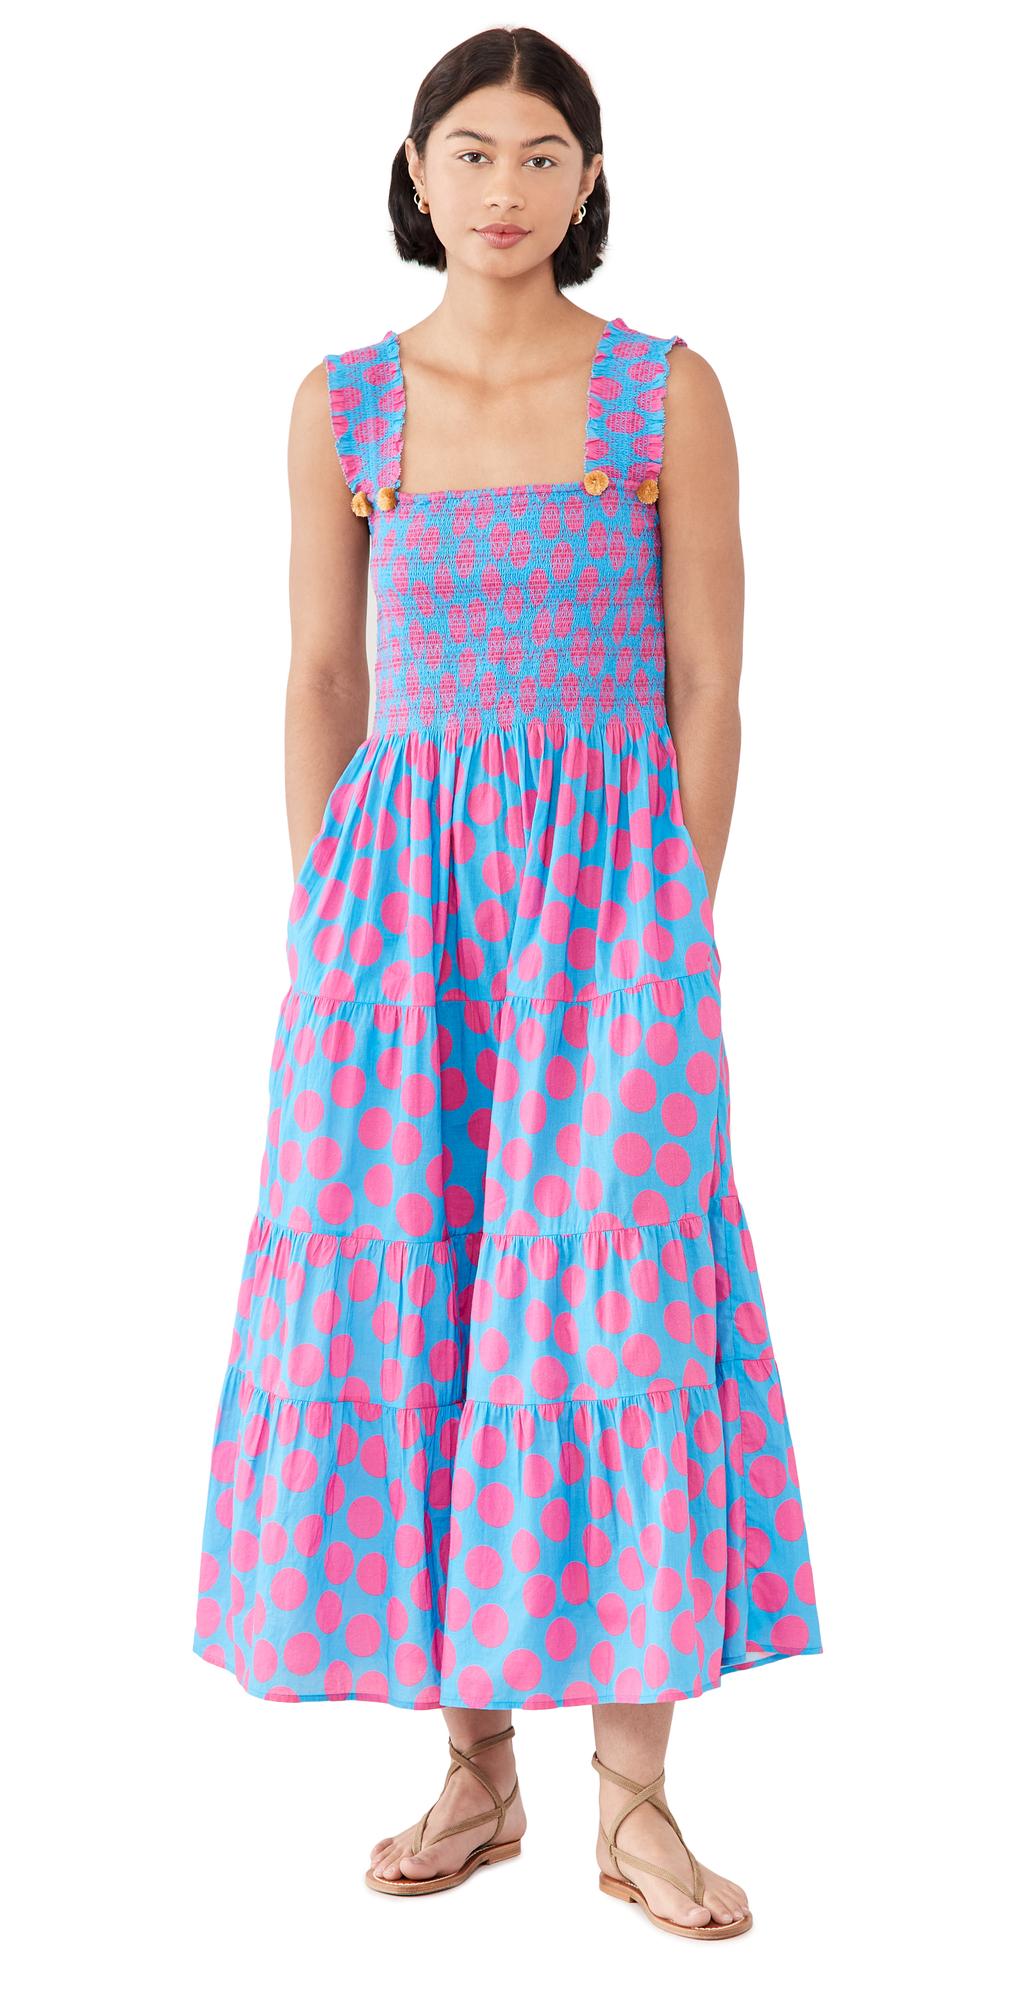 Leulla Dress